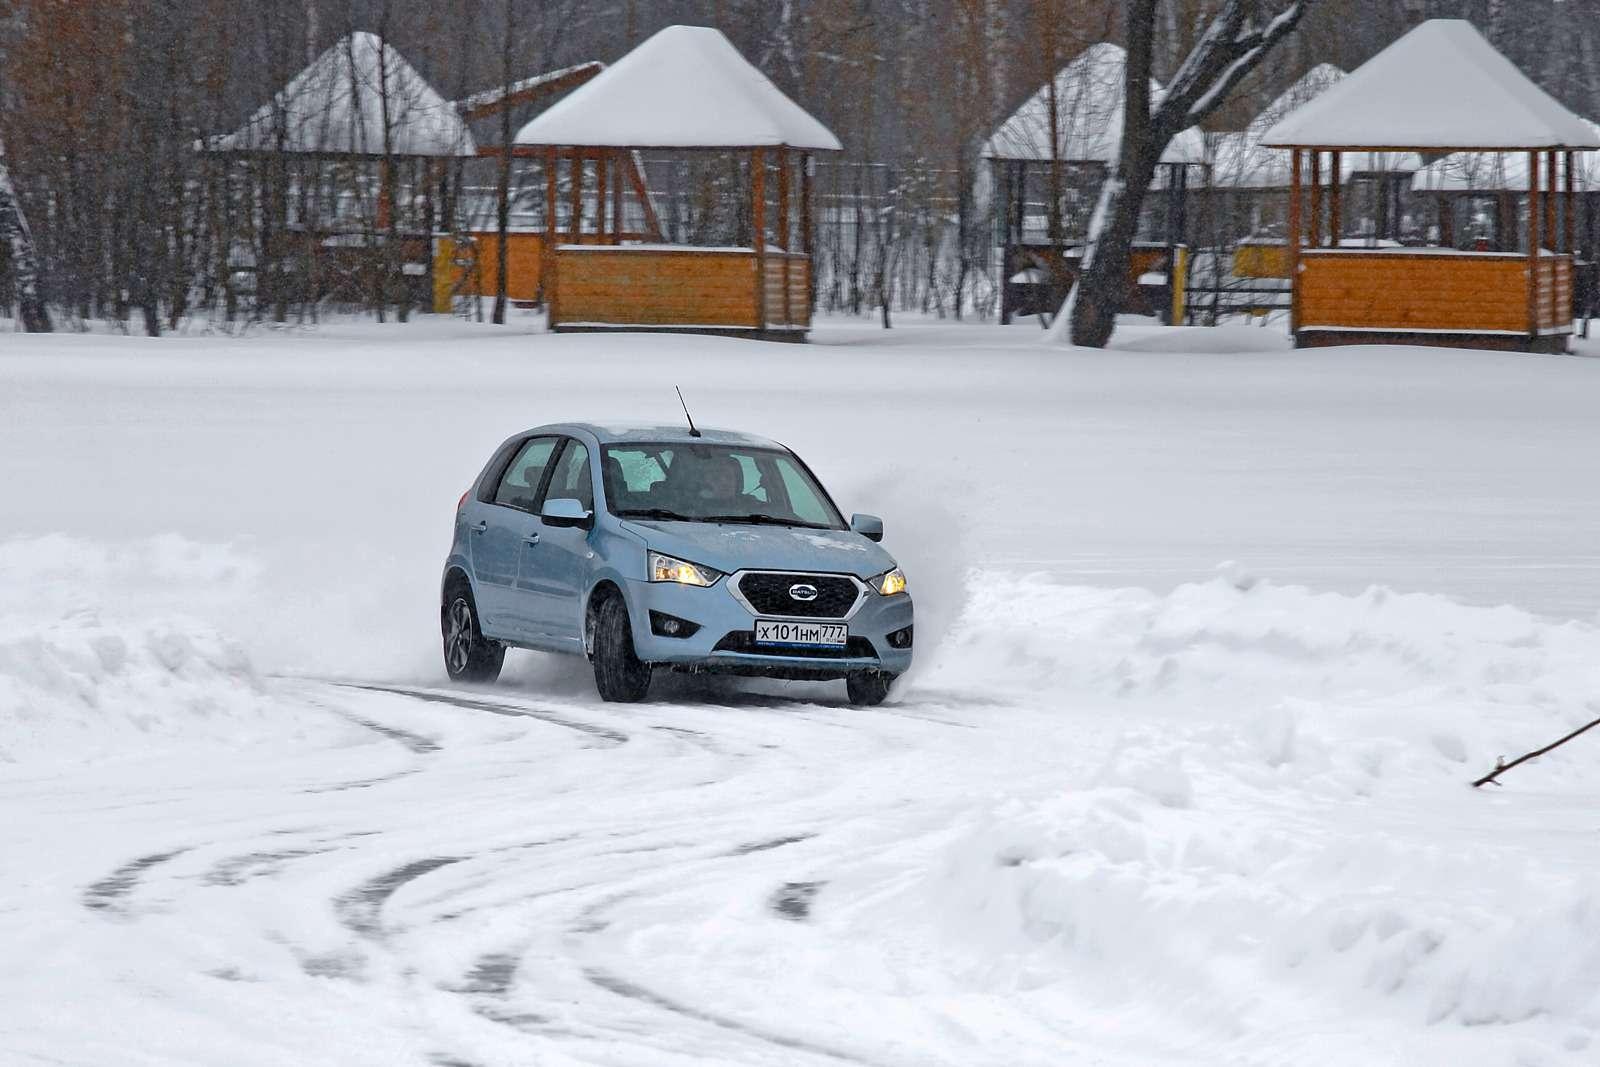 Большой зимний тест: Lada Vesta, Lada XRAY иDatsun mi-DO изпарка ЗР— фото 571453